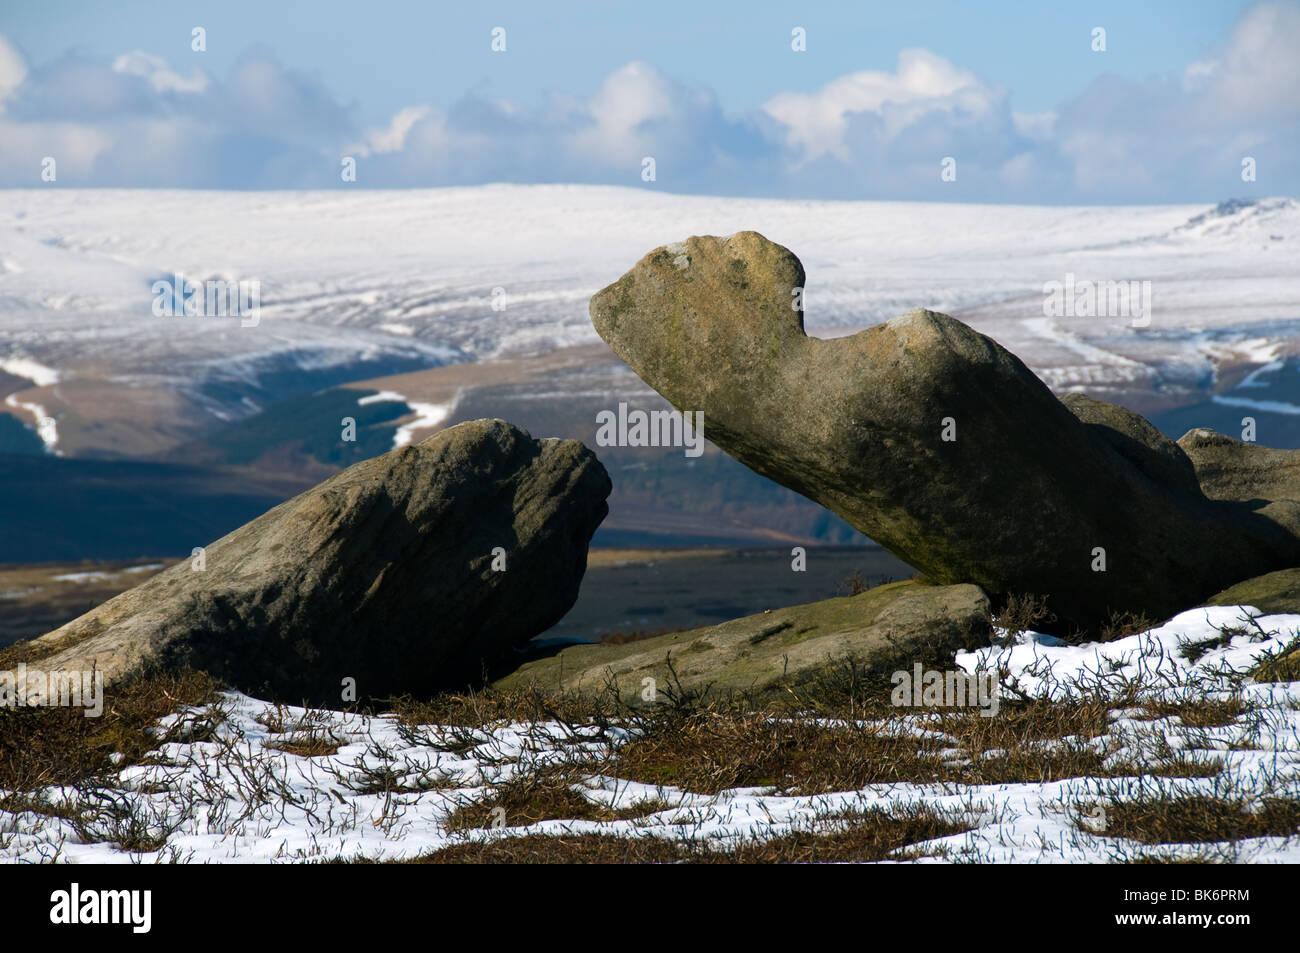 Bleaklow Fell from Derwent Edge, Derwent Moors, Peak District, Derbyshire, England, UK - Stock Image